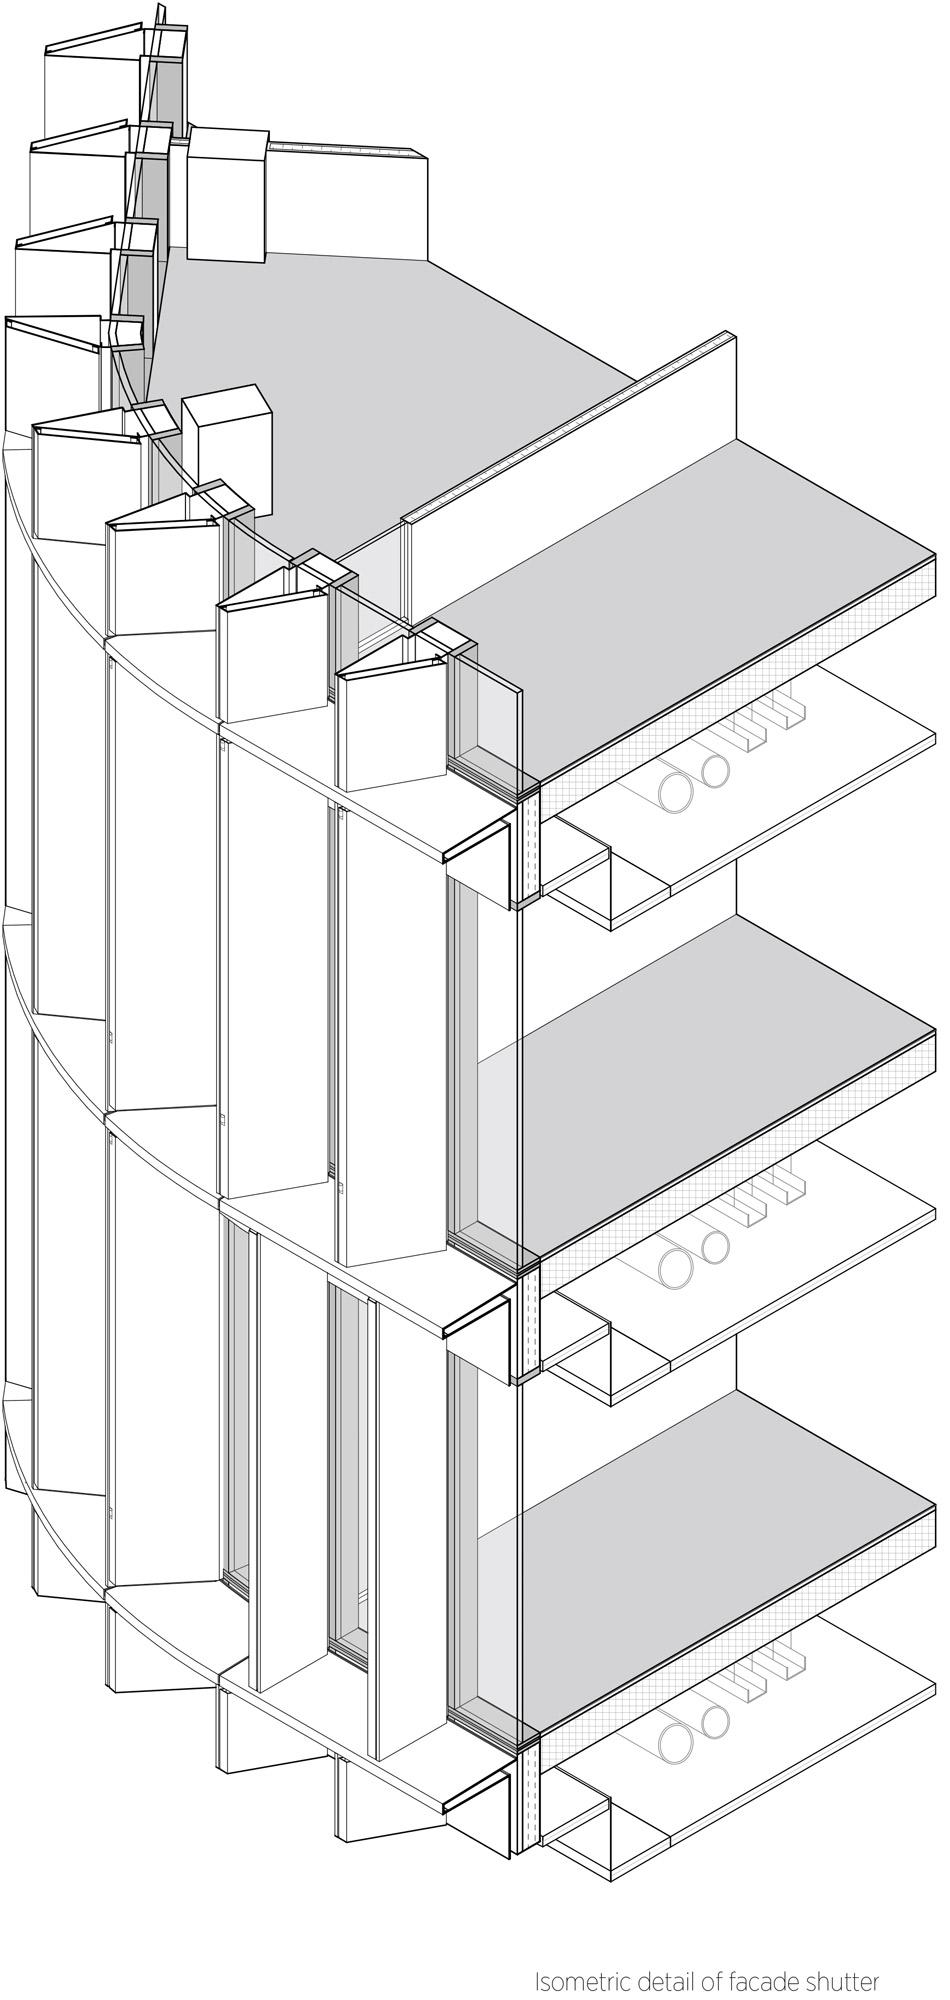 Concept © C.F. Møller Architects